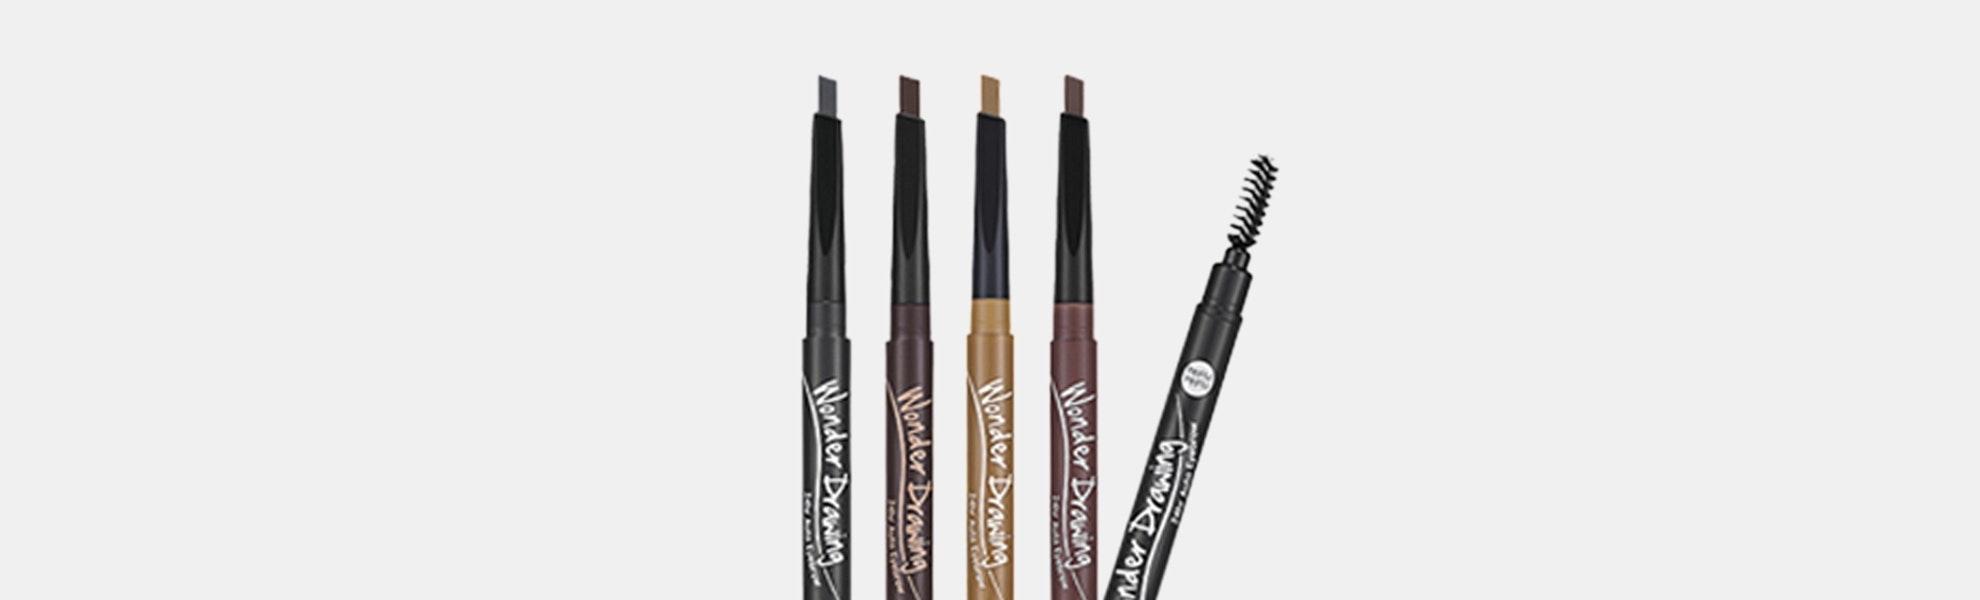 Holika Holika Wonder Drawing 24-Hour Eyebrow Pencil